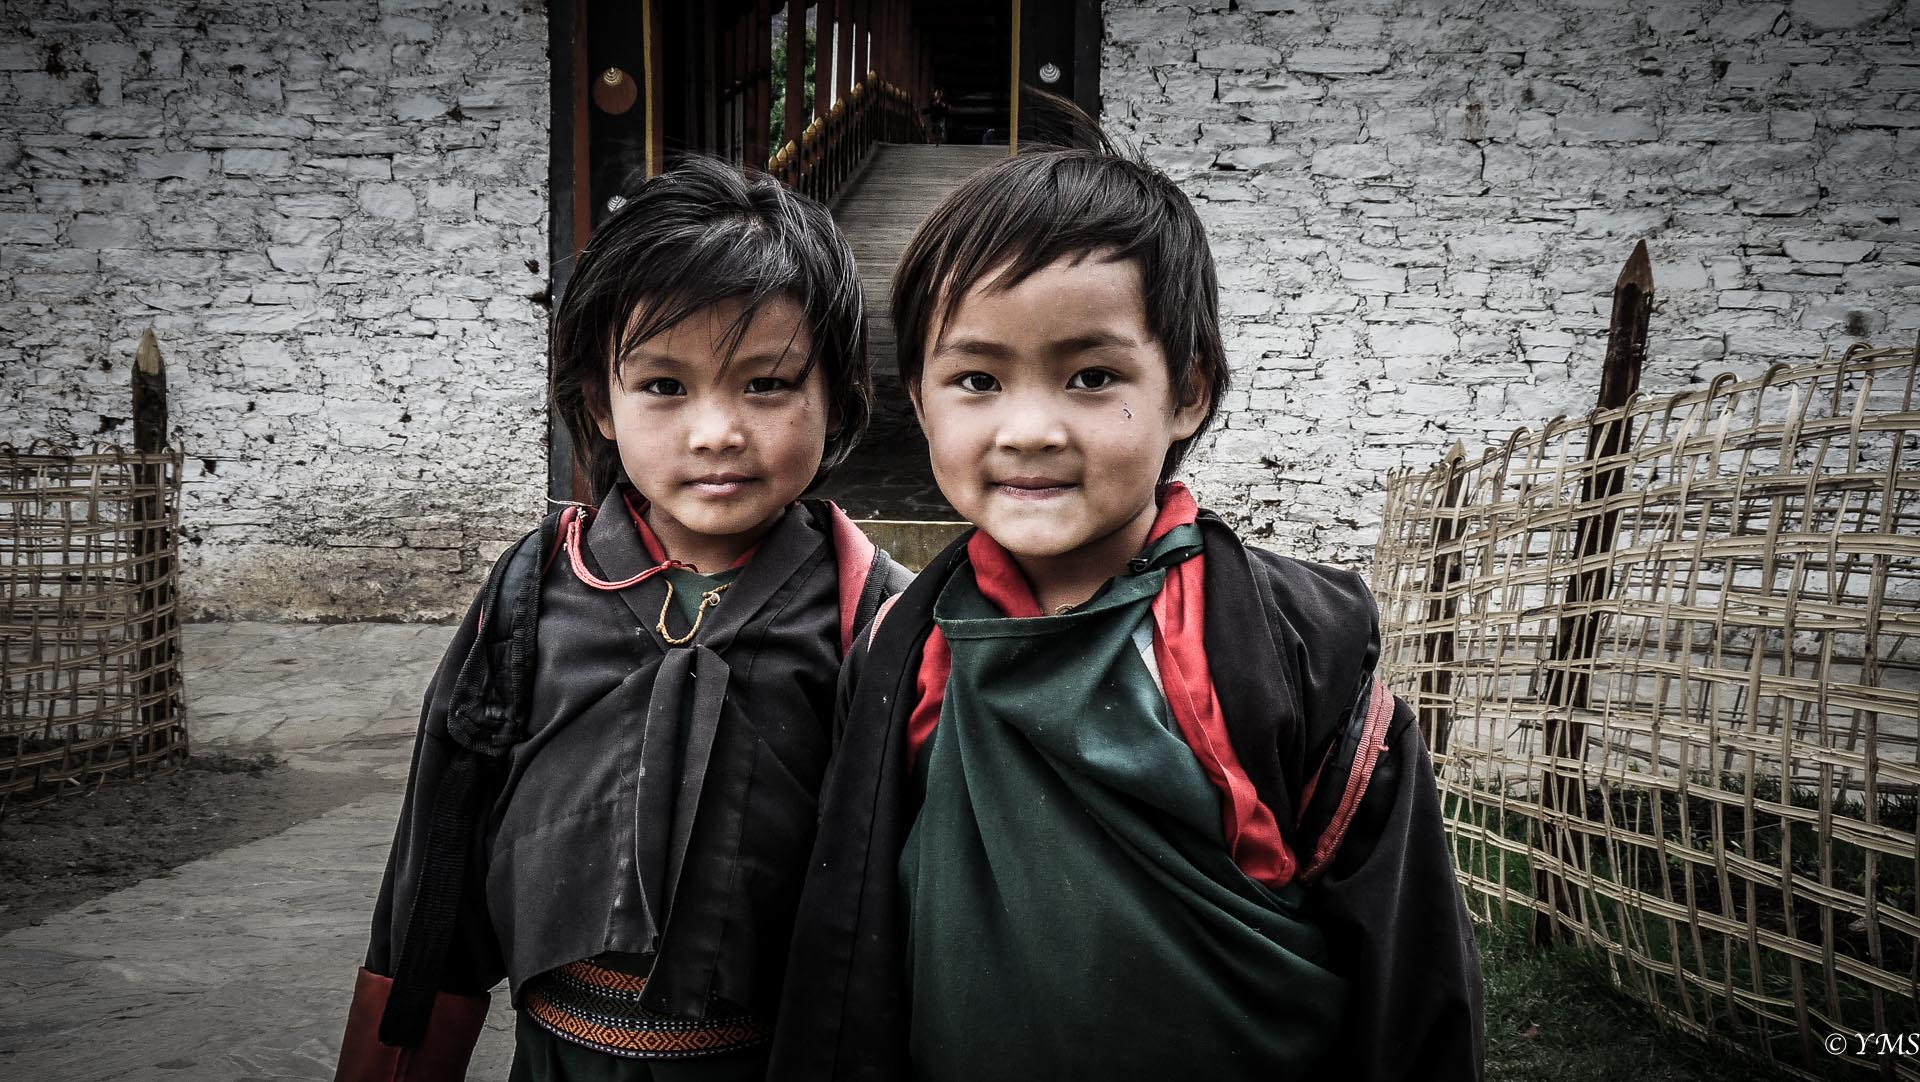 Bhutan - Dolls